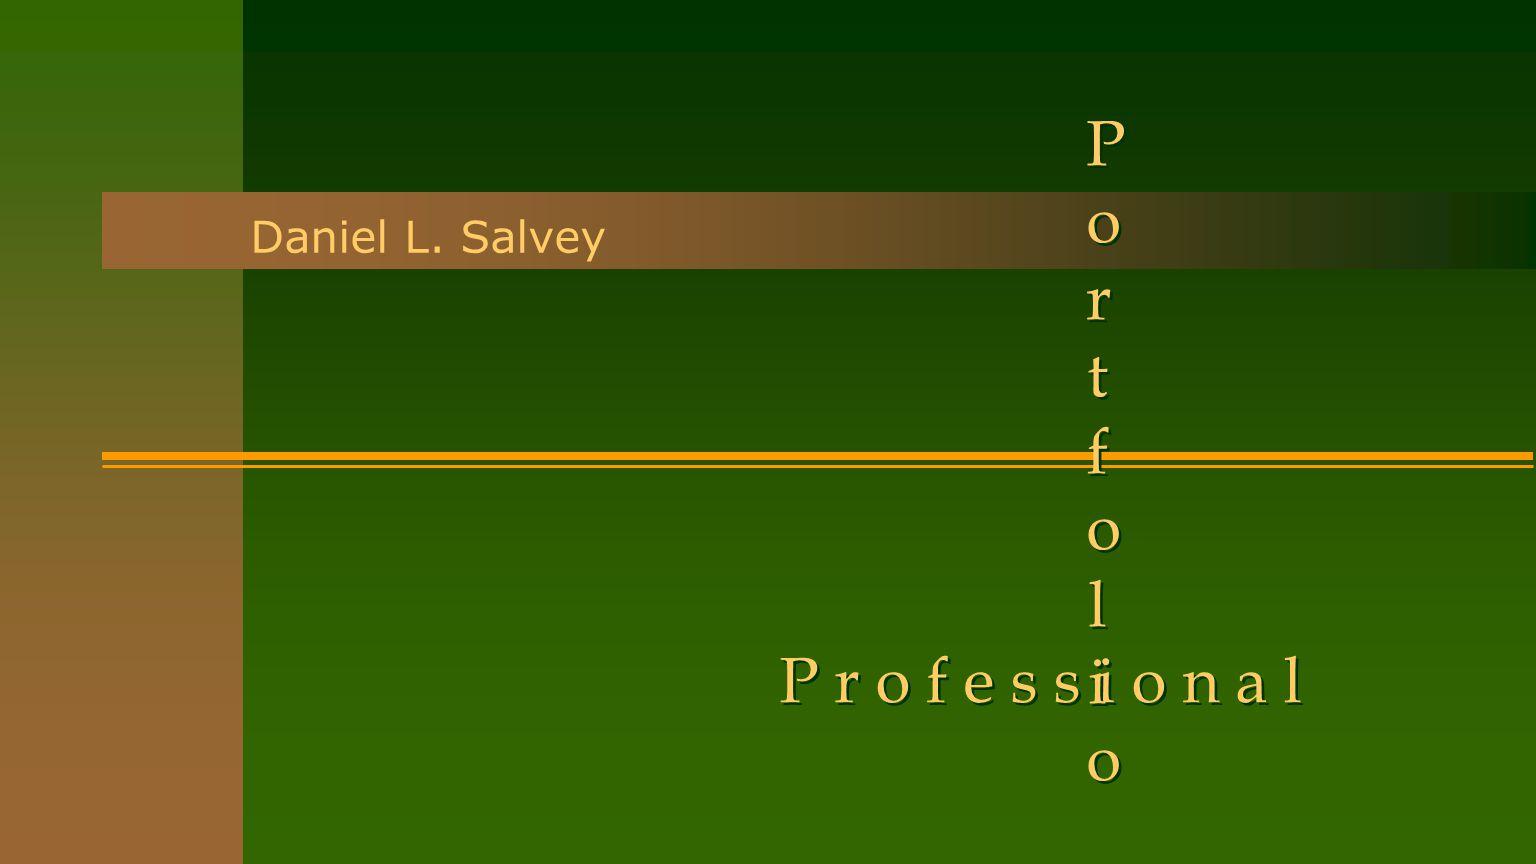 P r o f e s s i o n a l Daniel L. Salvey PortfolioPortfolio PortfolioPortfolio